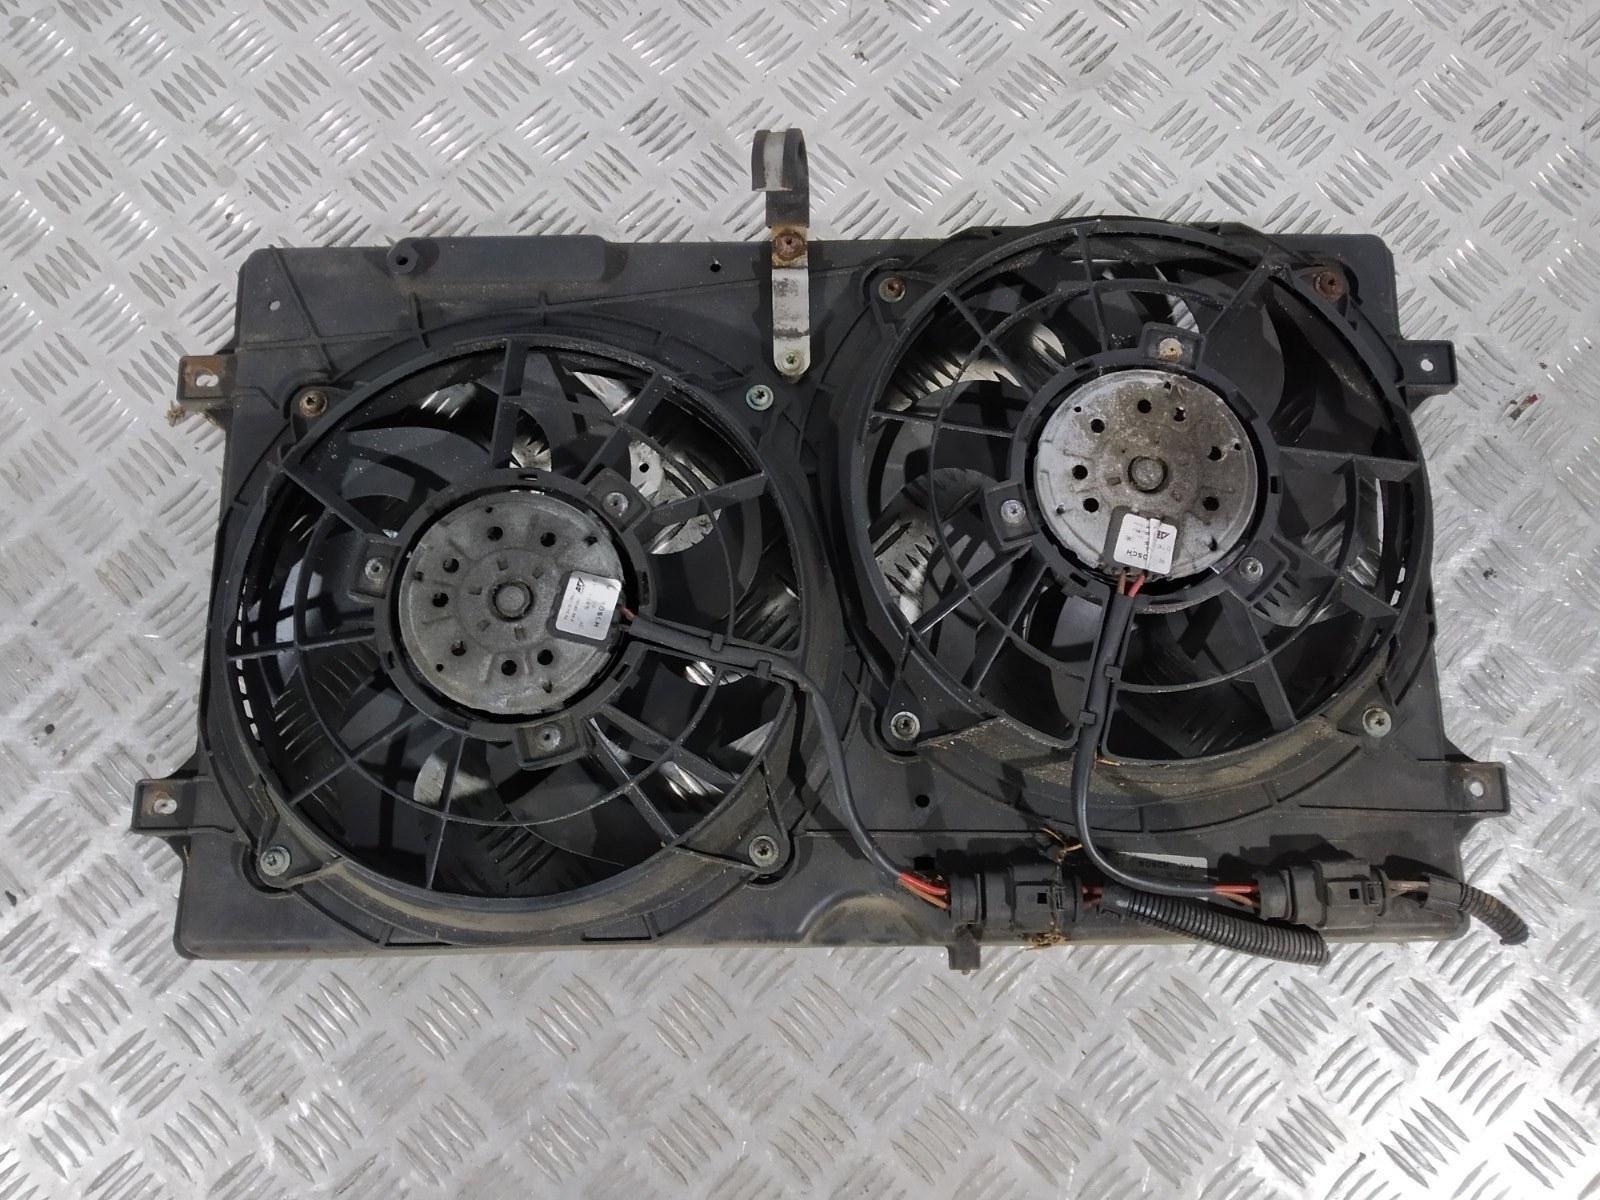 Вентилятор радиатора Seat Alhambra 1.9 TDI 2002 (б/у)